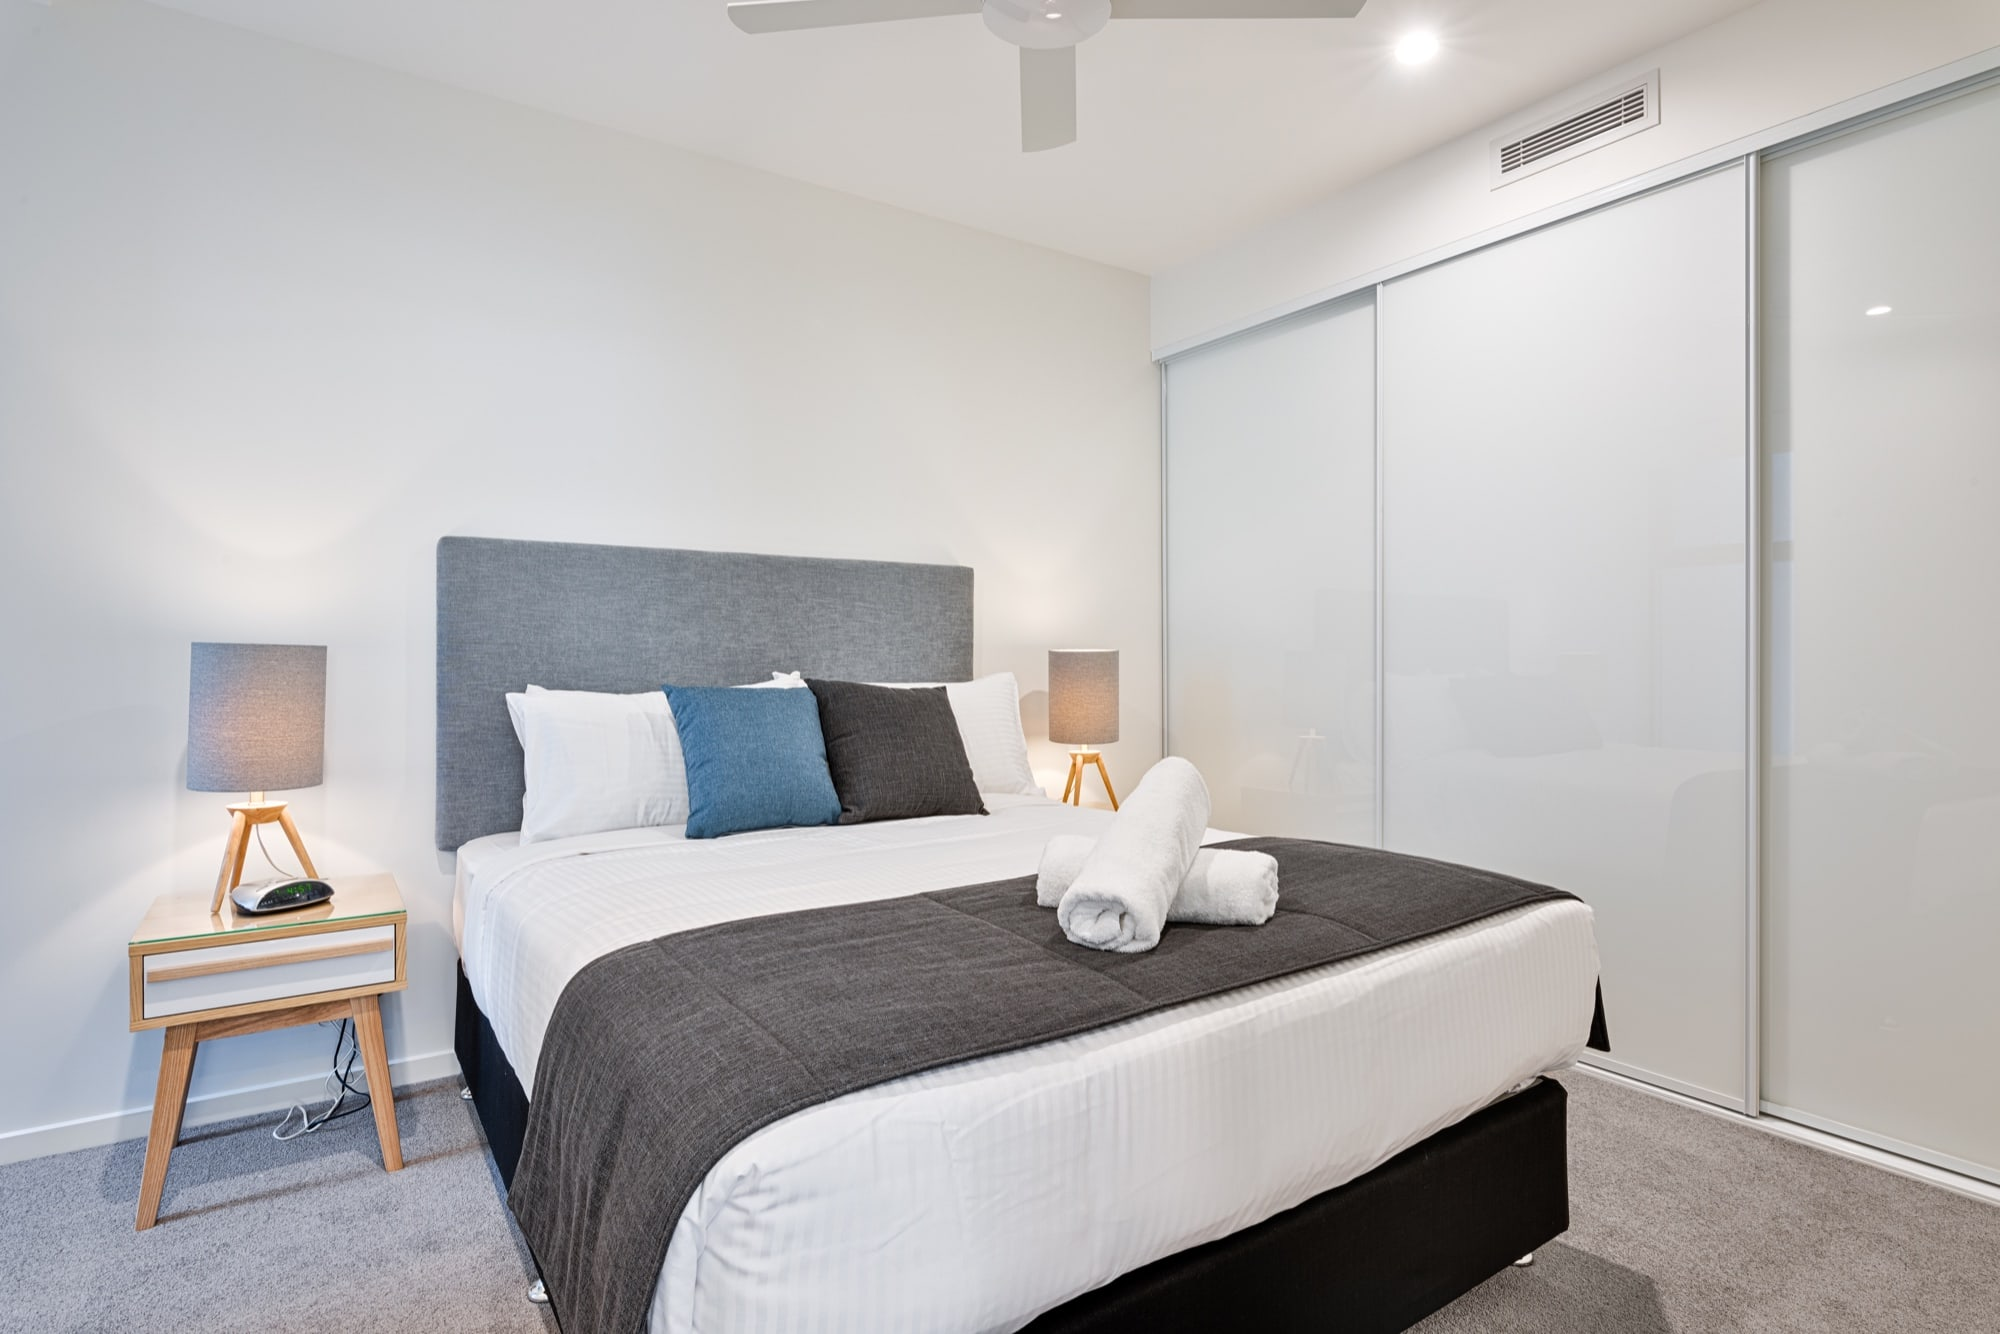 unit-202-3-bedroom-13